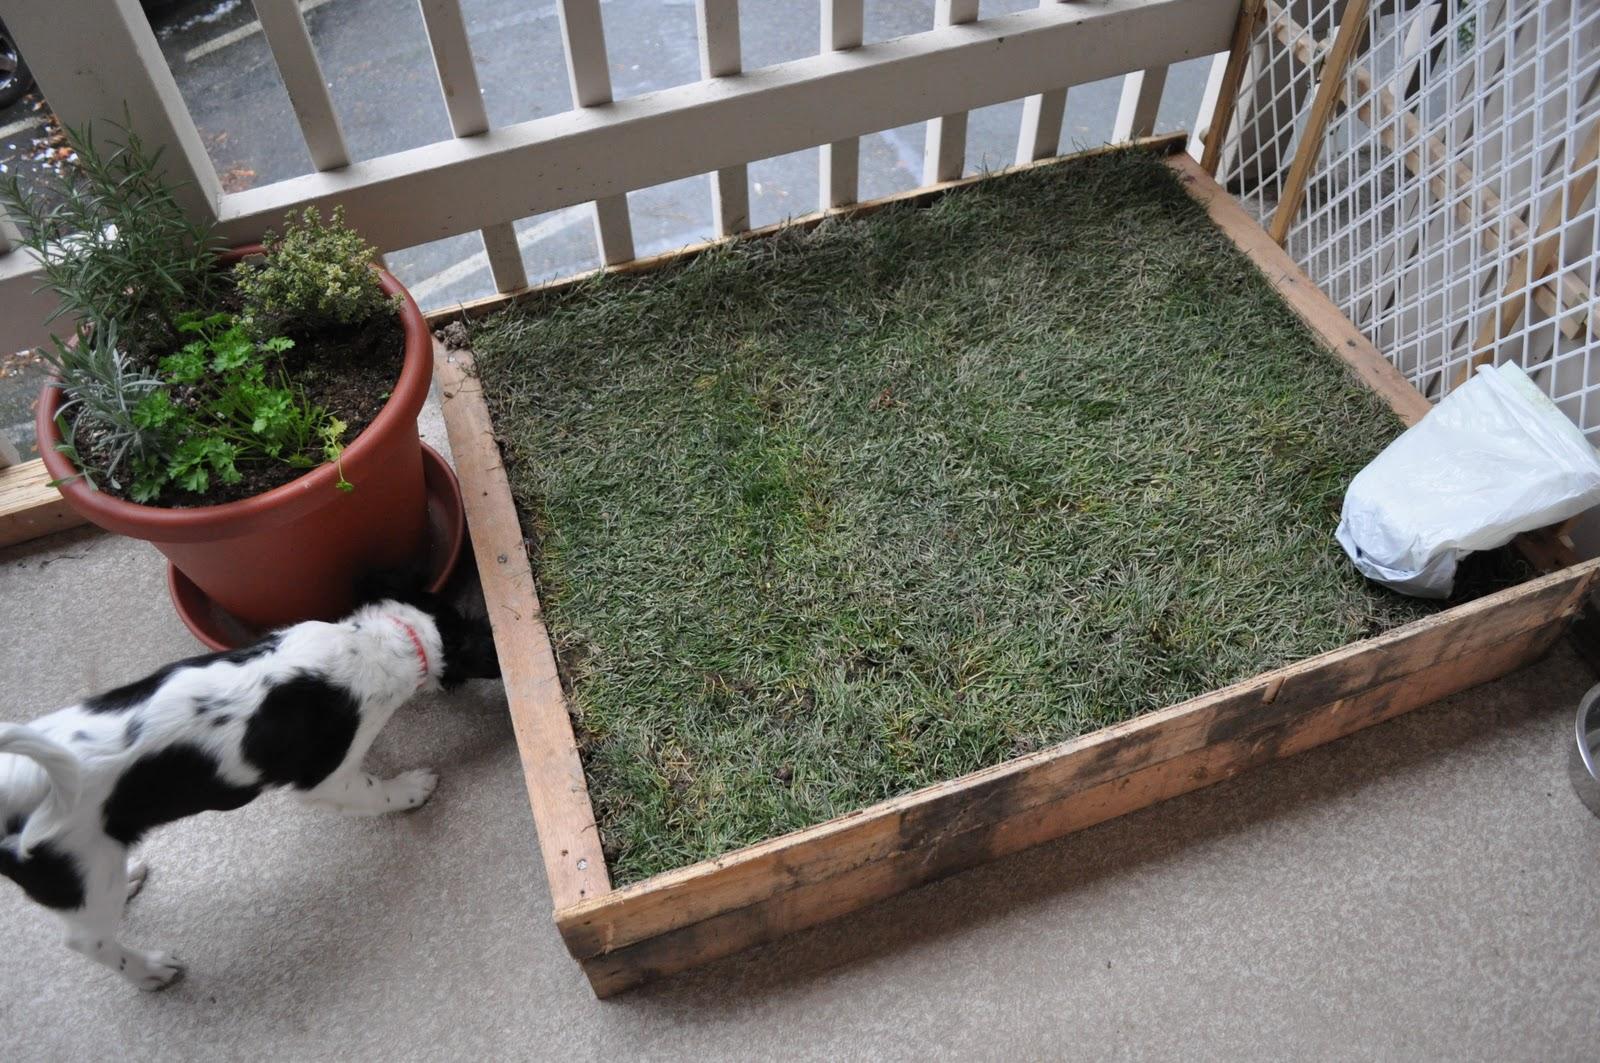 The Adventures of Kym & Dustin DIY Patio Dog Grass